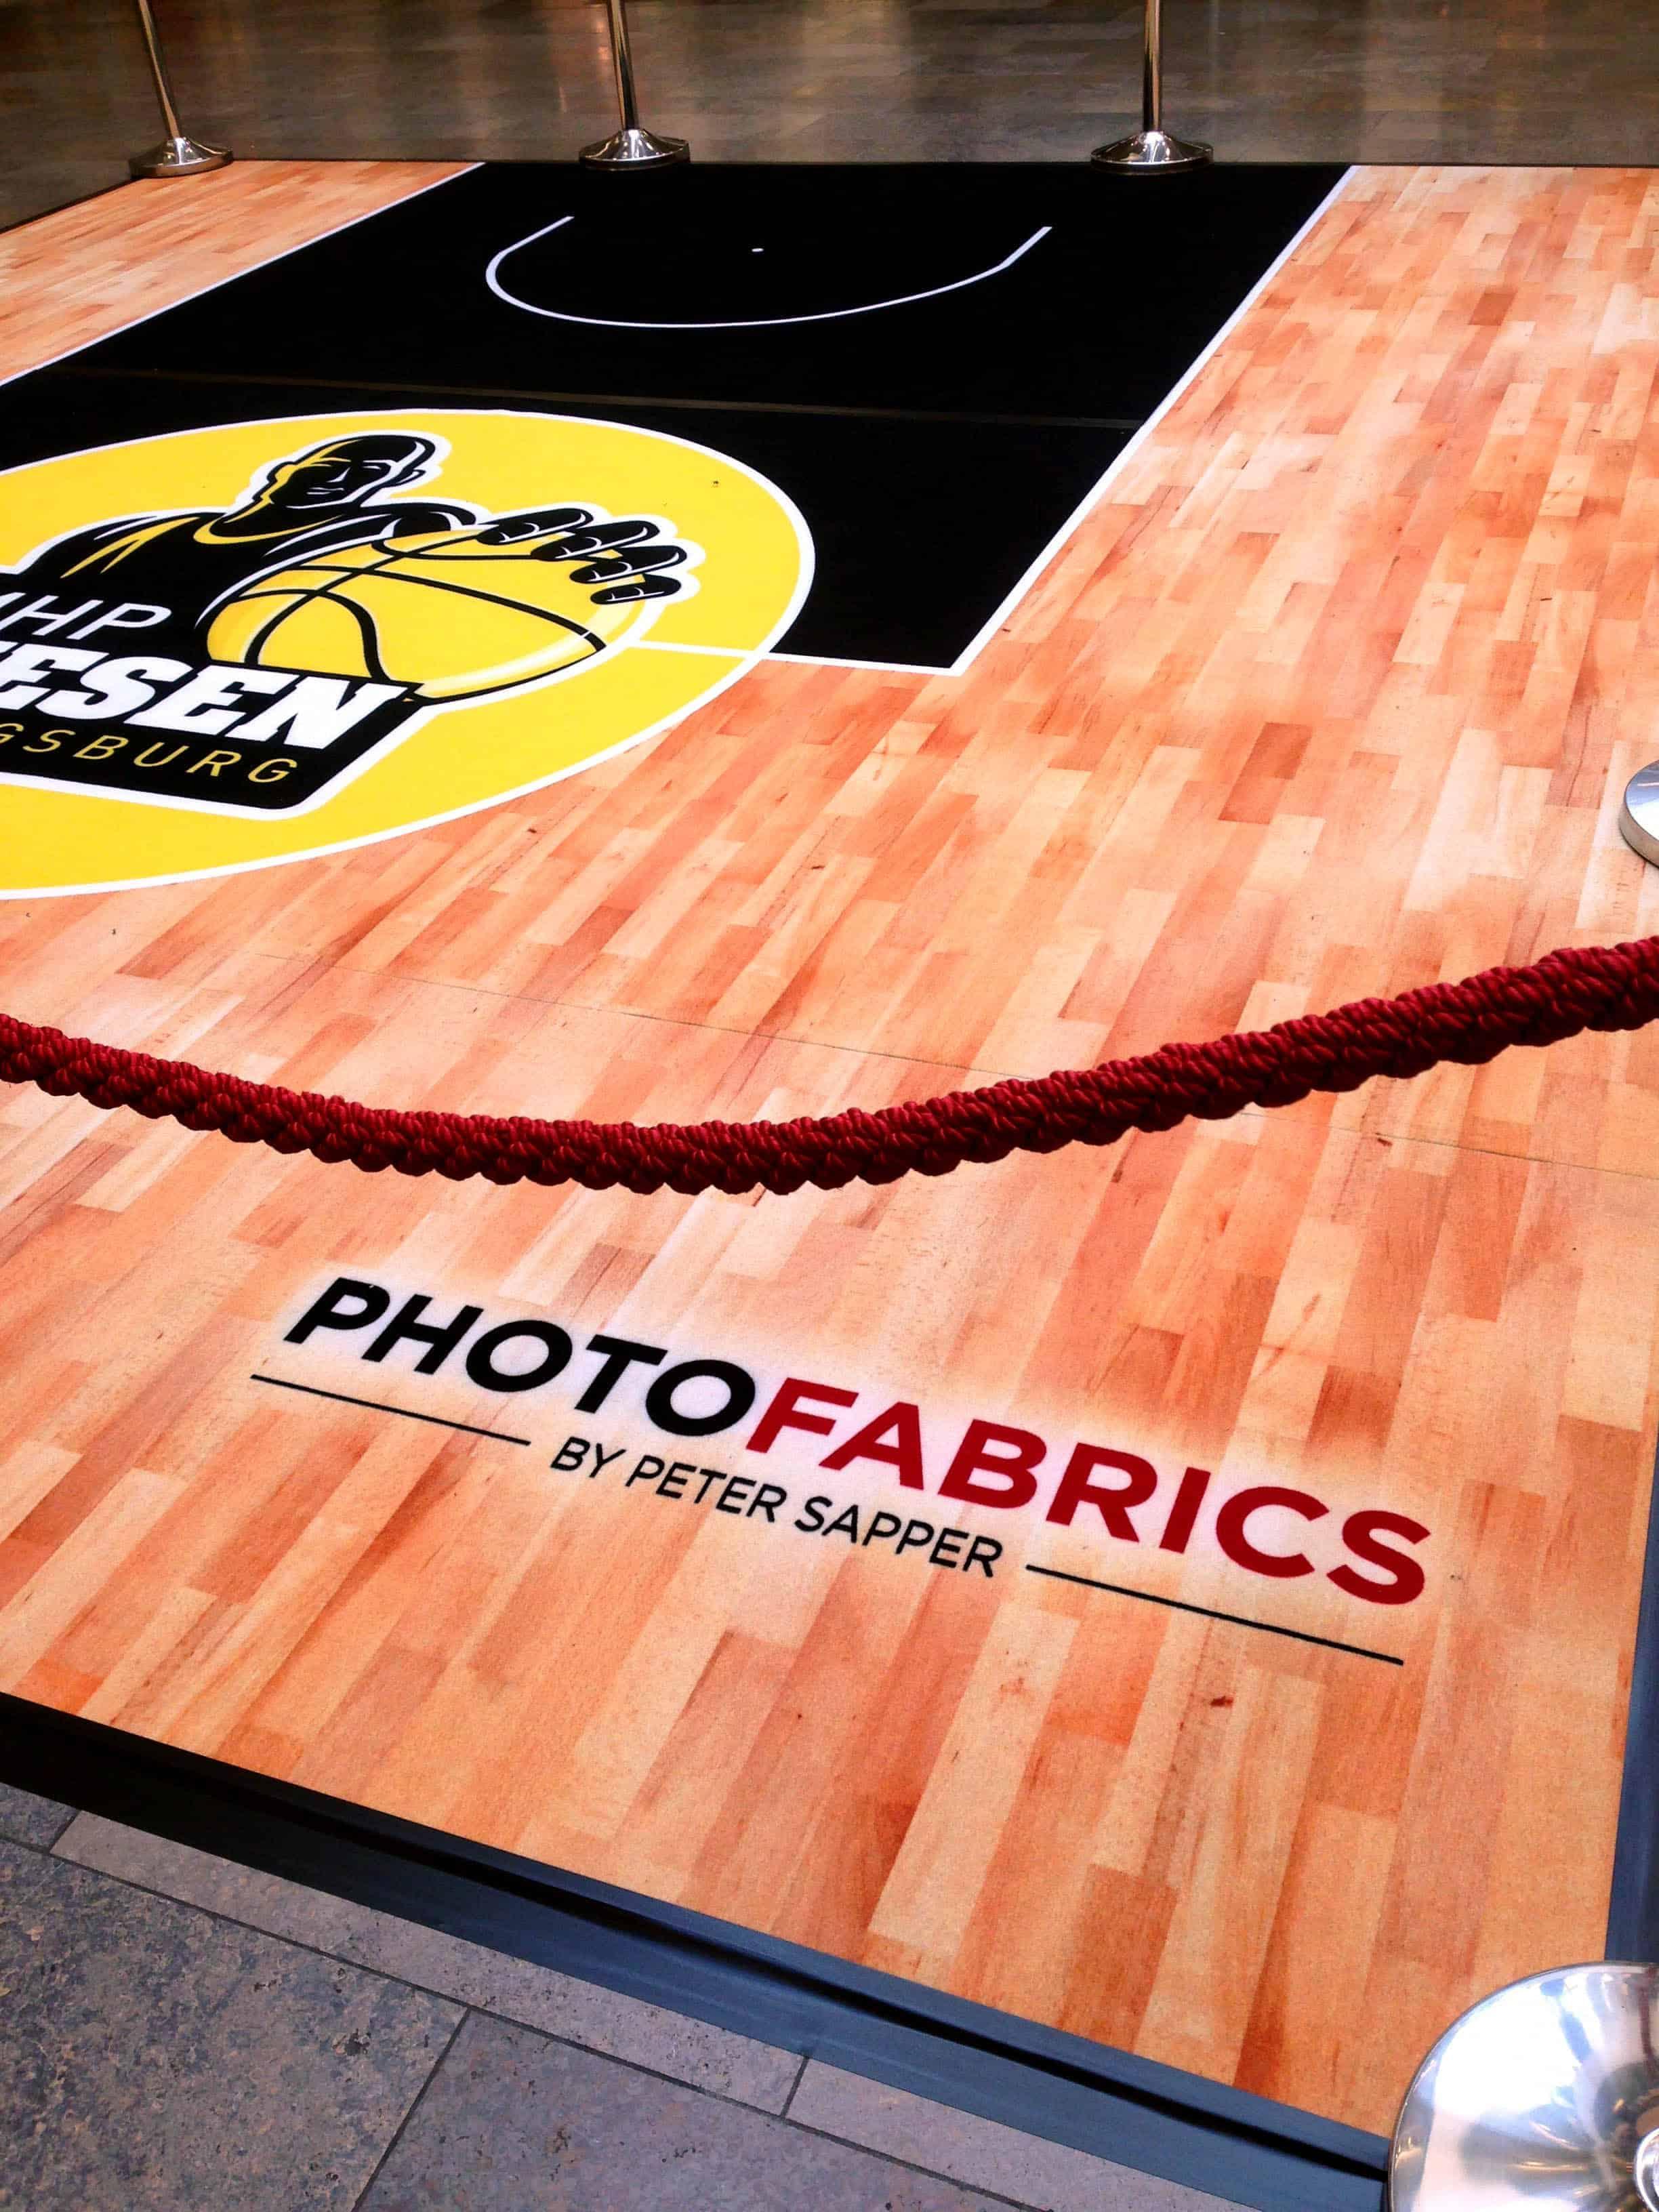 Basketballfeld auf PF 400  Photofabricsde